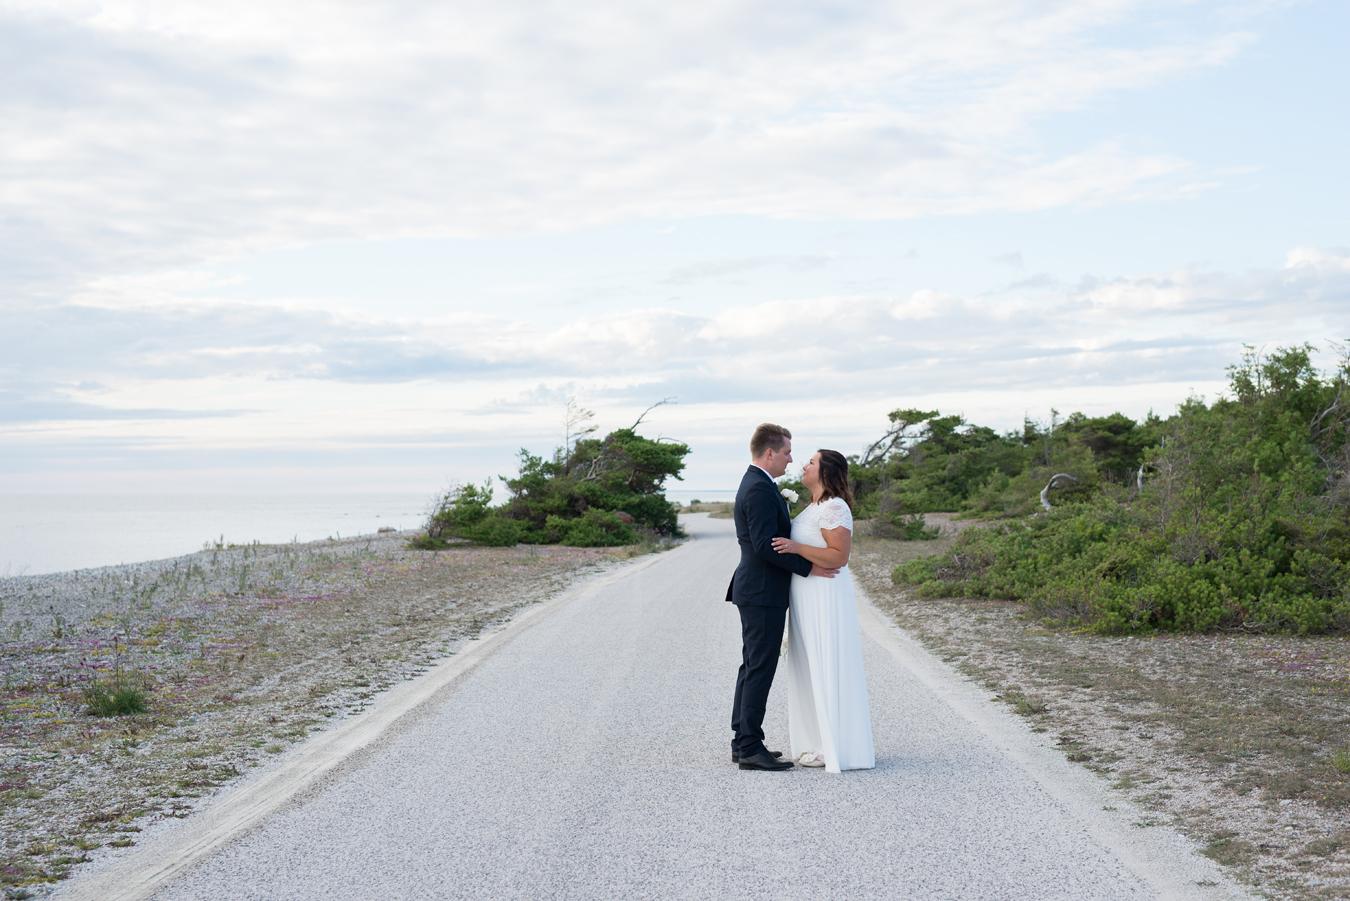 105-bröllopsfotograf-gotland-ekstakusten-neas-fotografi.jpg